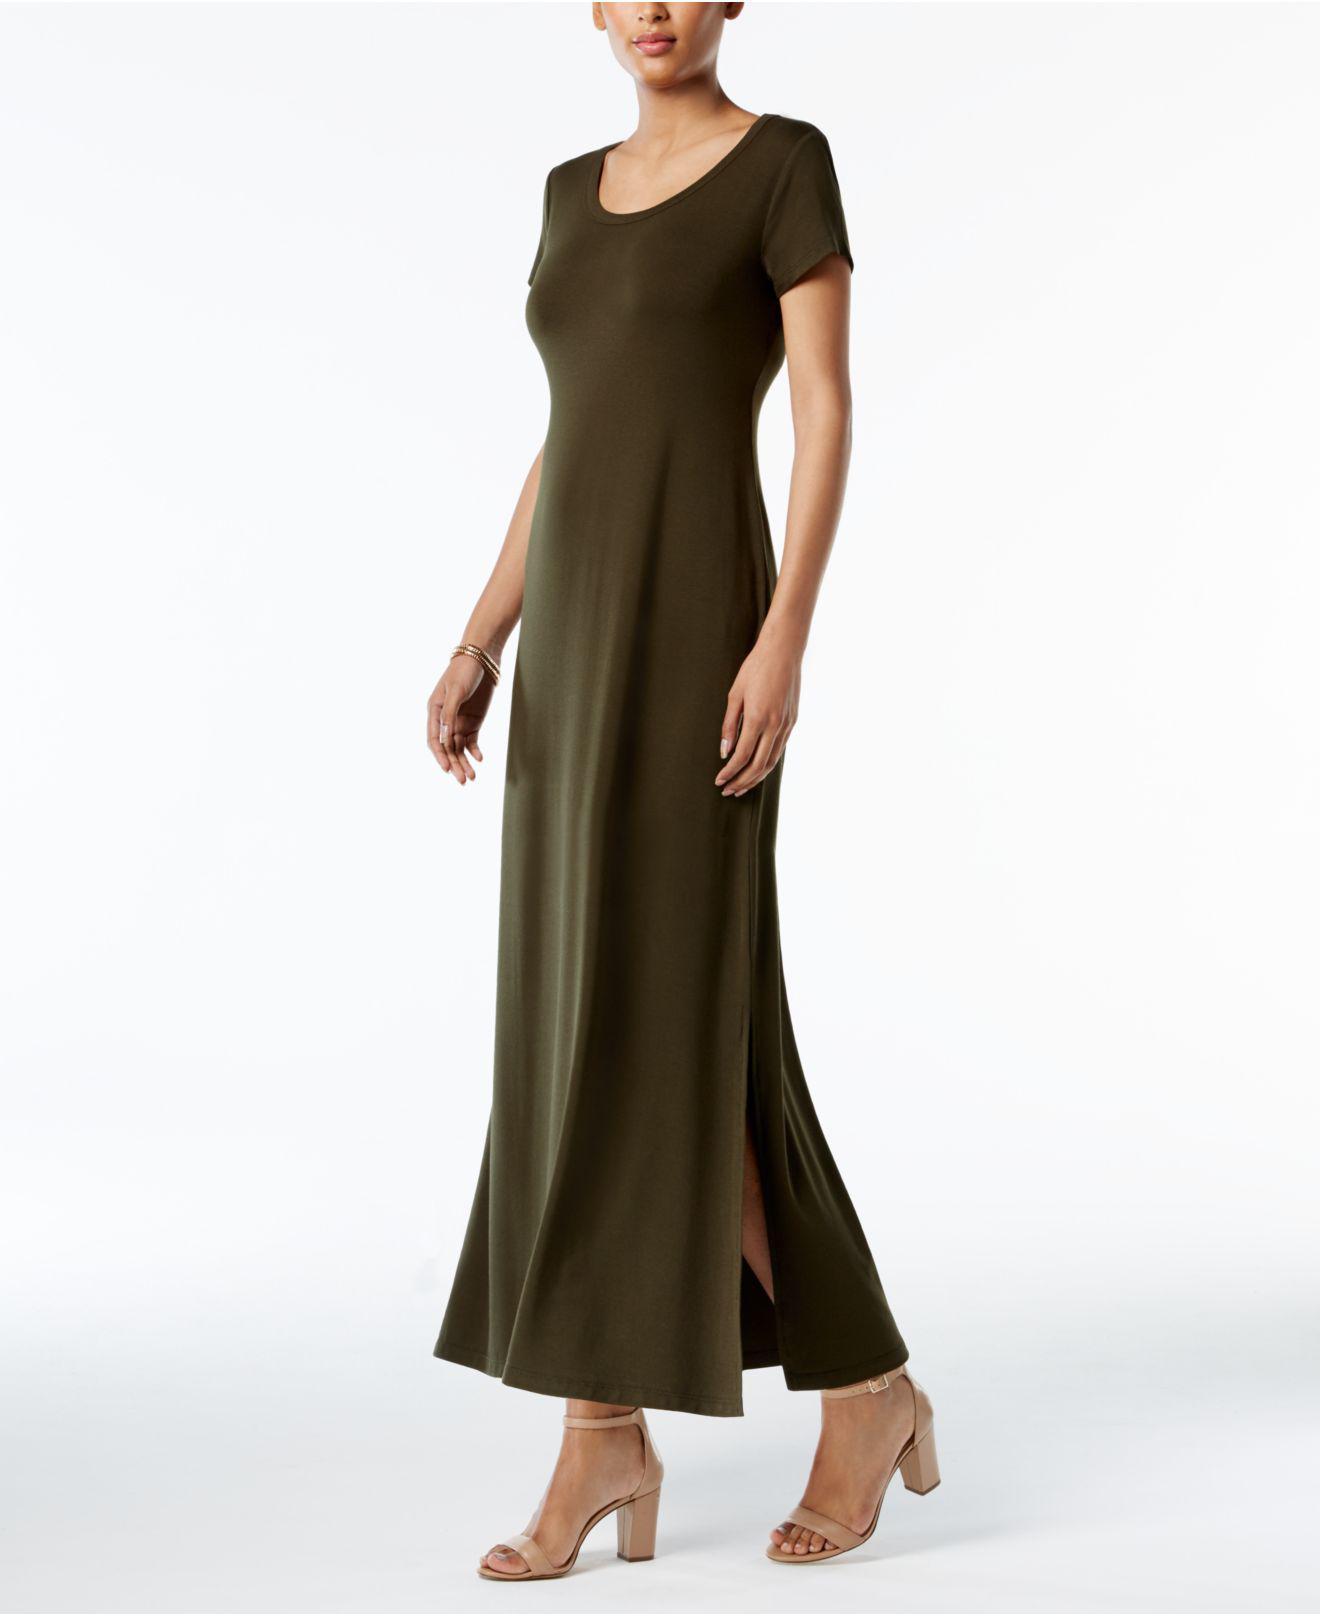 5ce5c830214 Evening Dresses On Sale At Macys - Data Dynamic AG